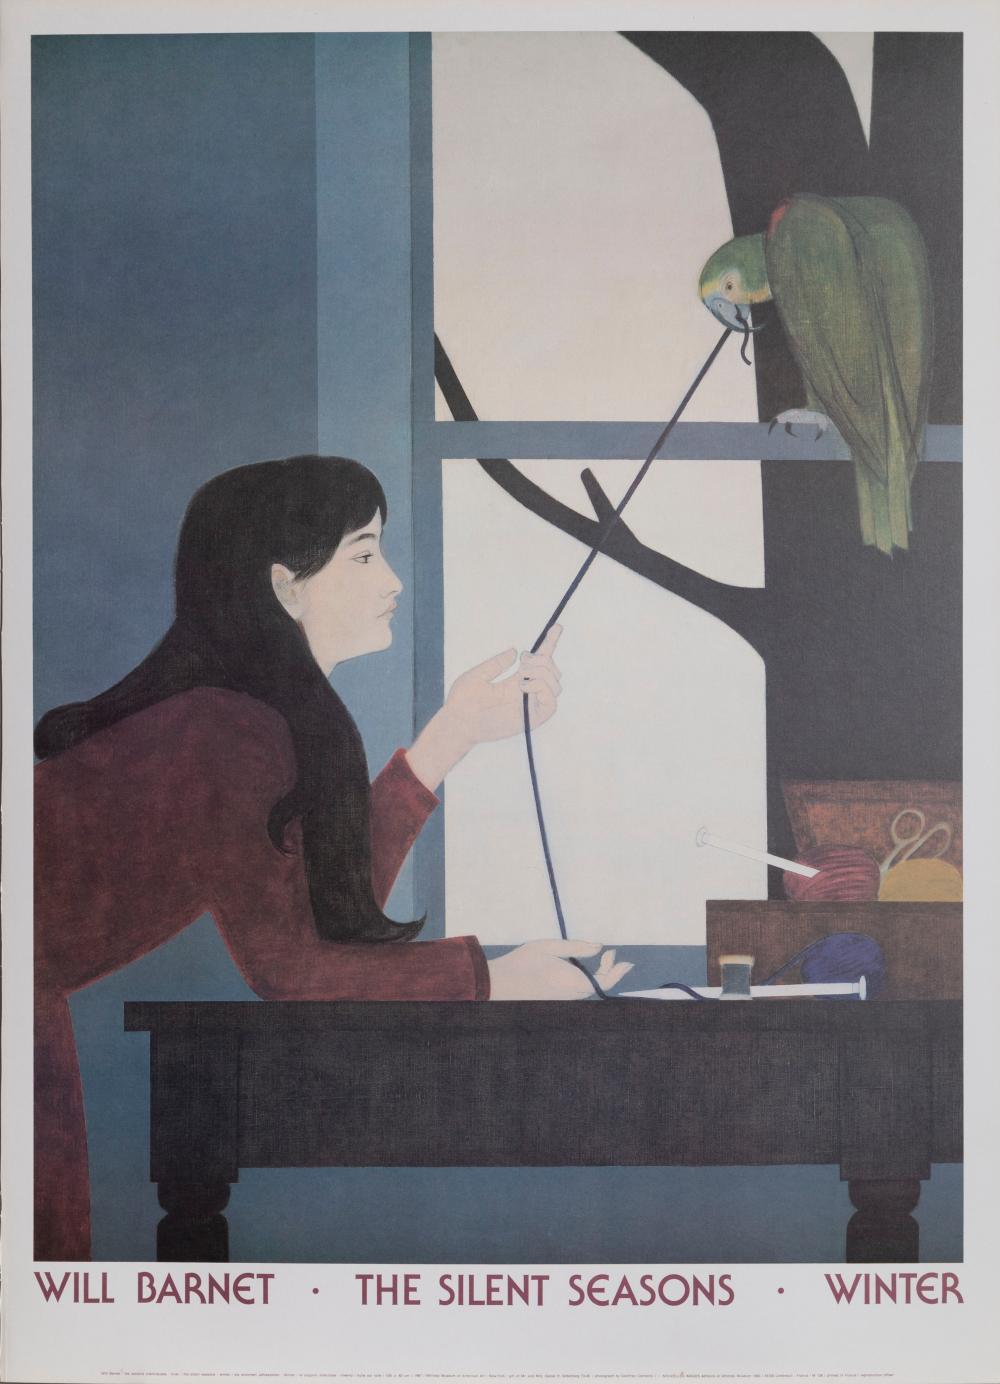 Will Barnet, The Silent Seasons - Winter, Poster on board